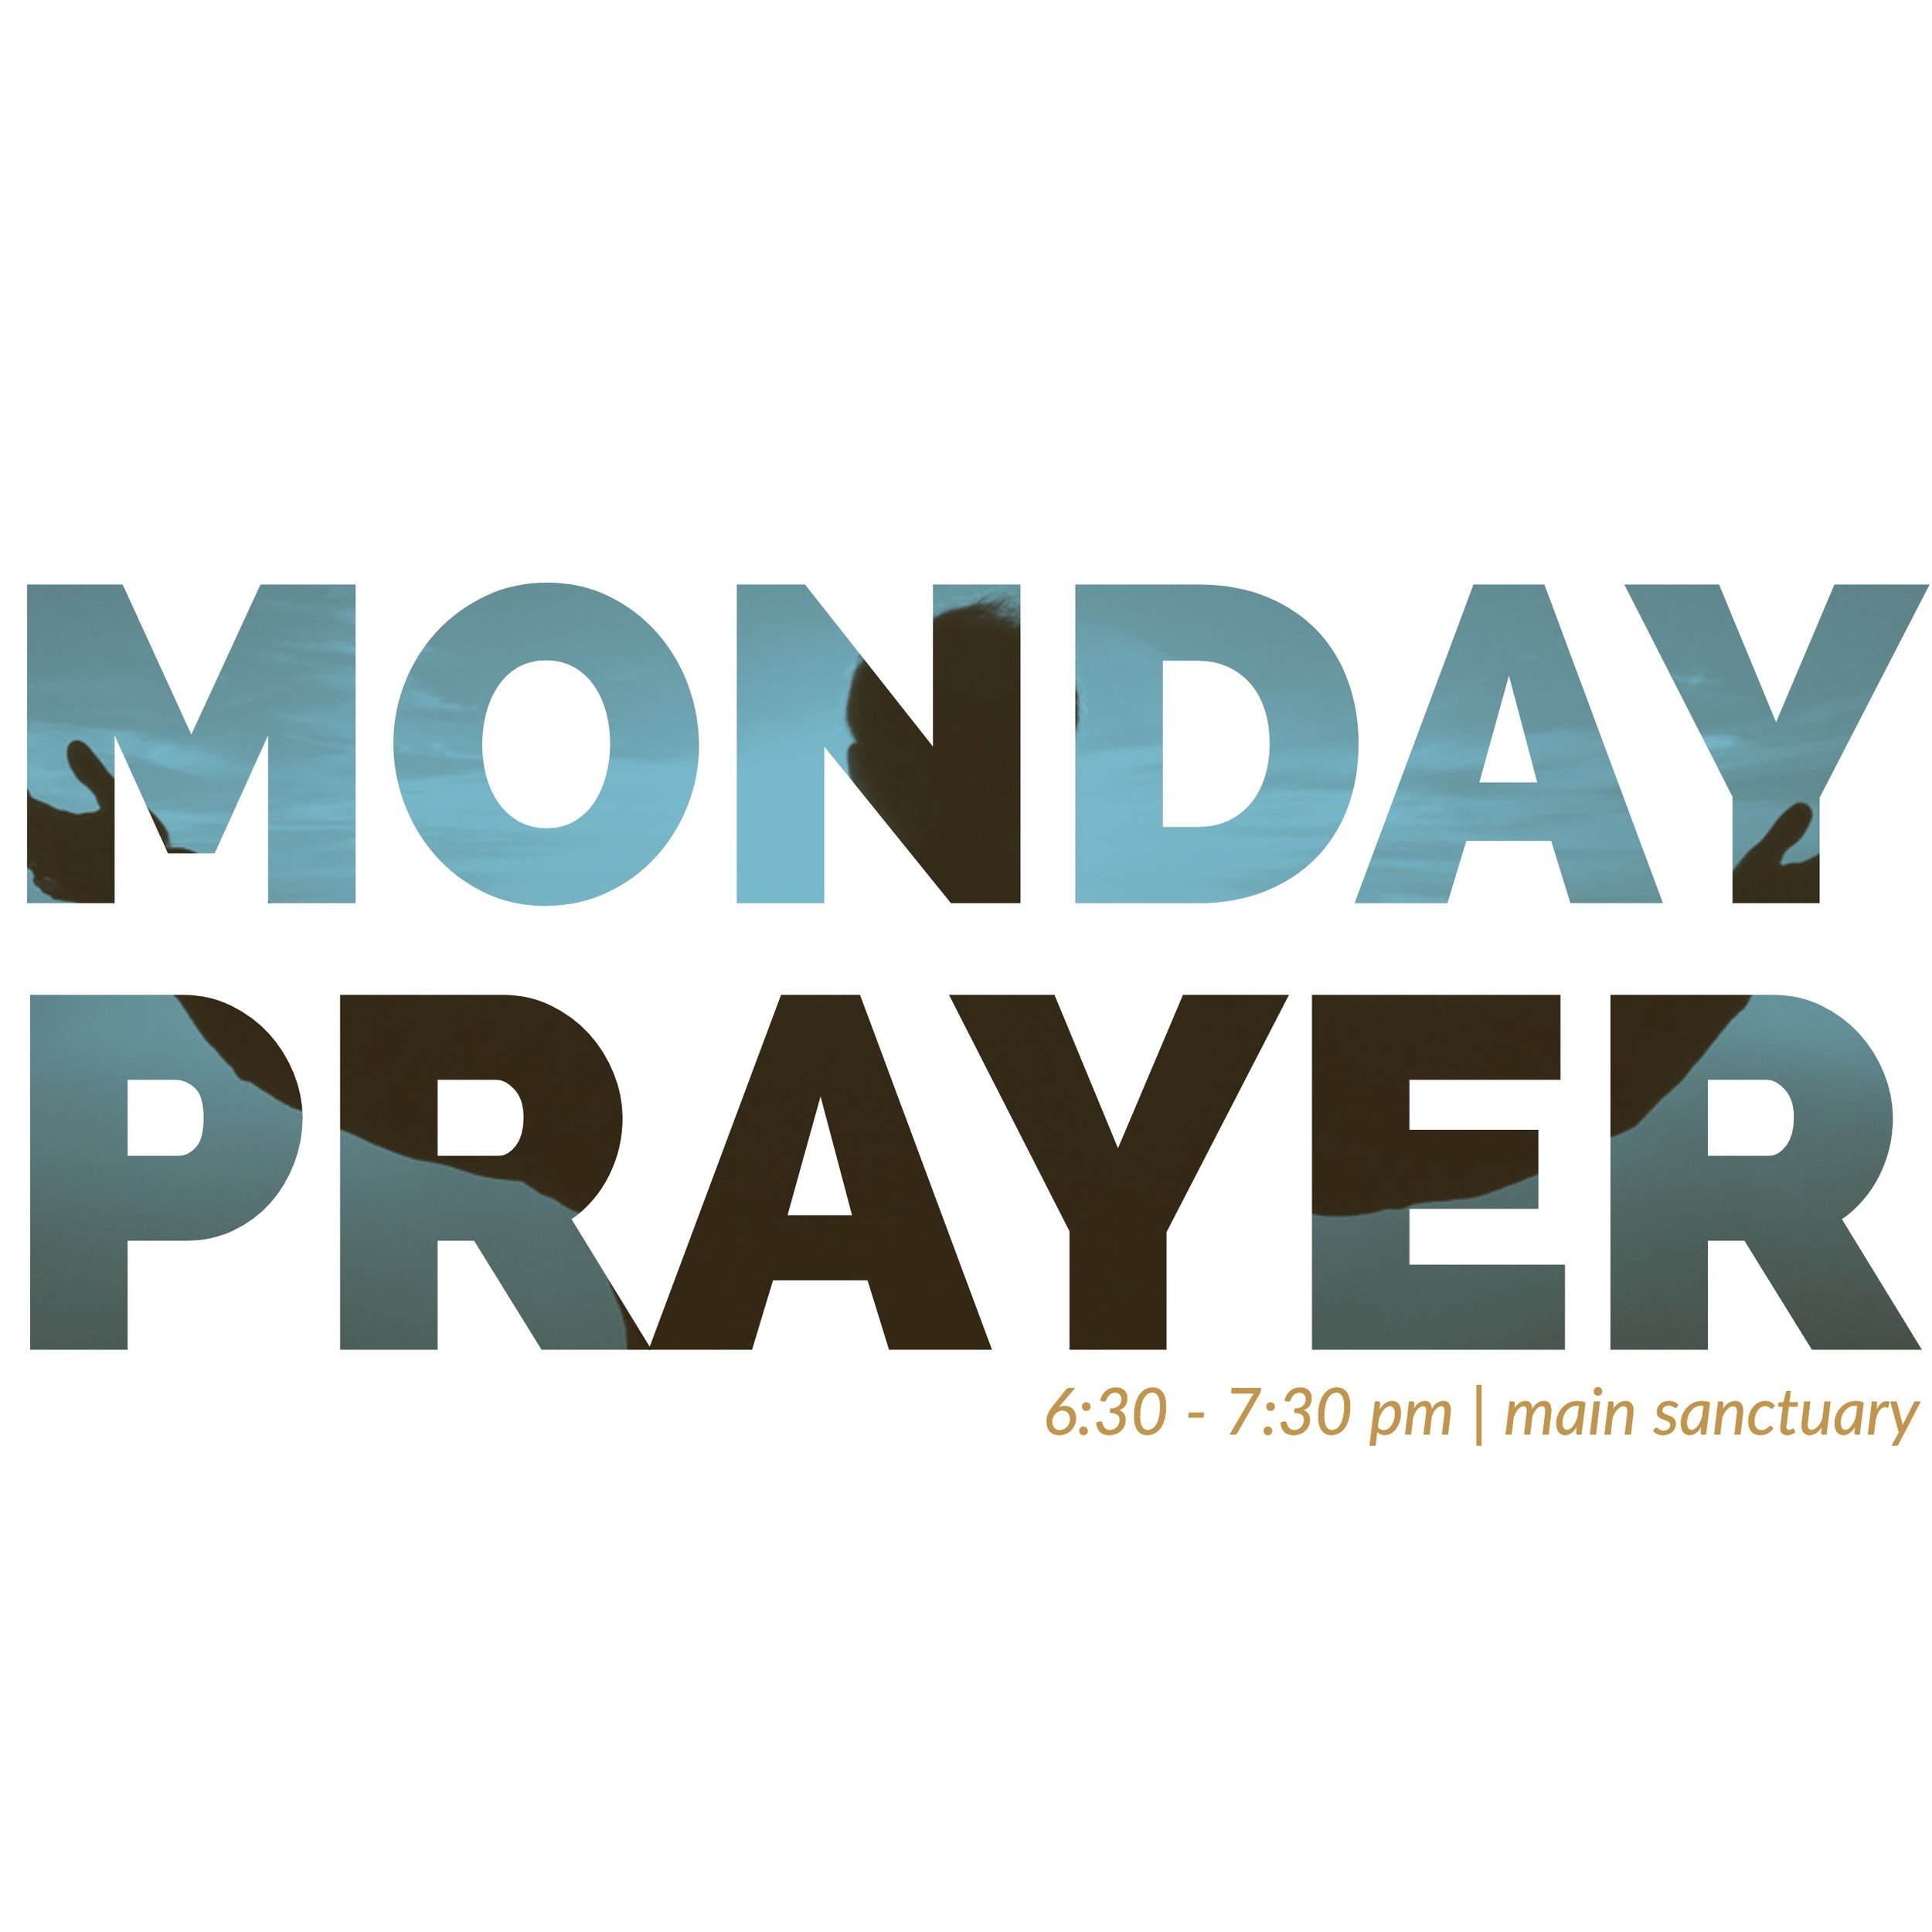 Monday Night Prayer service at The Anchor Church, 6:30 - 7:30pm | main sanctuary